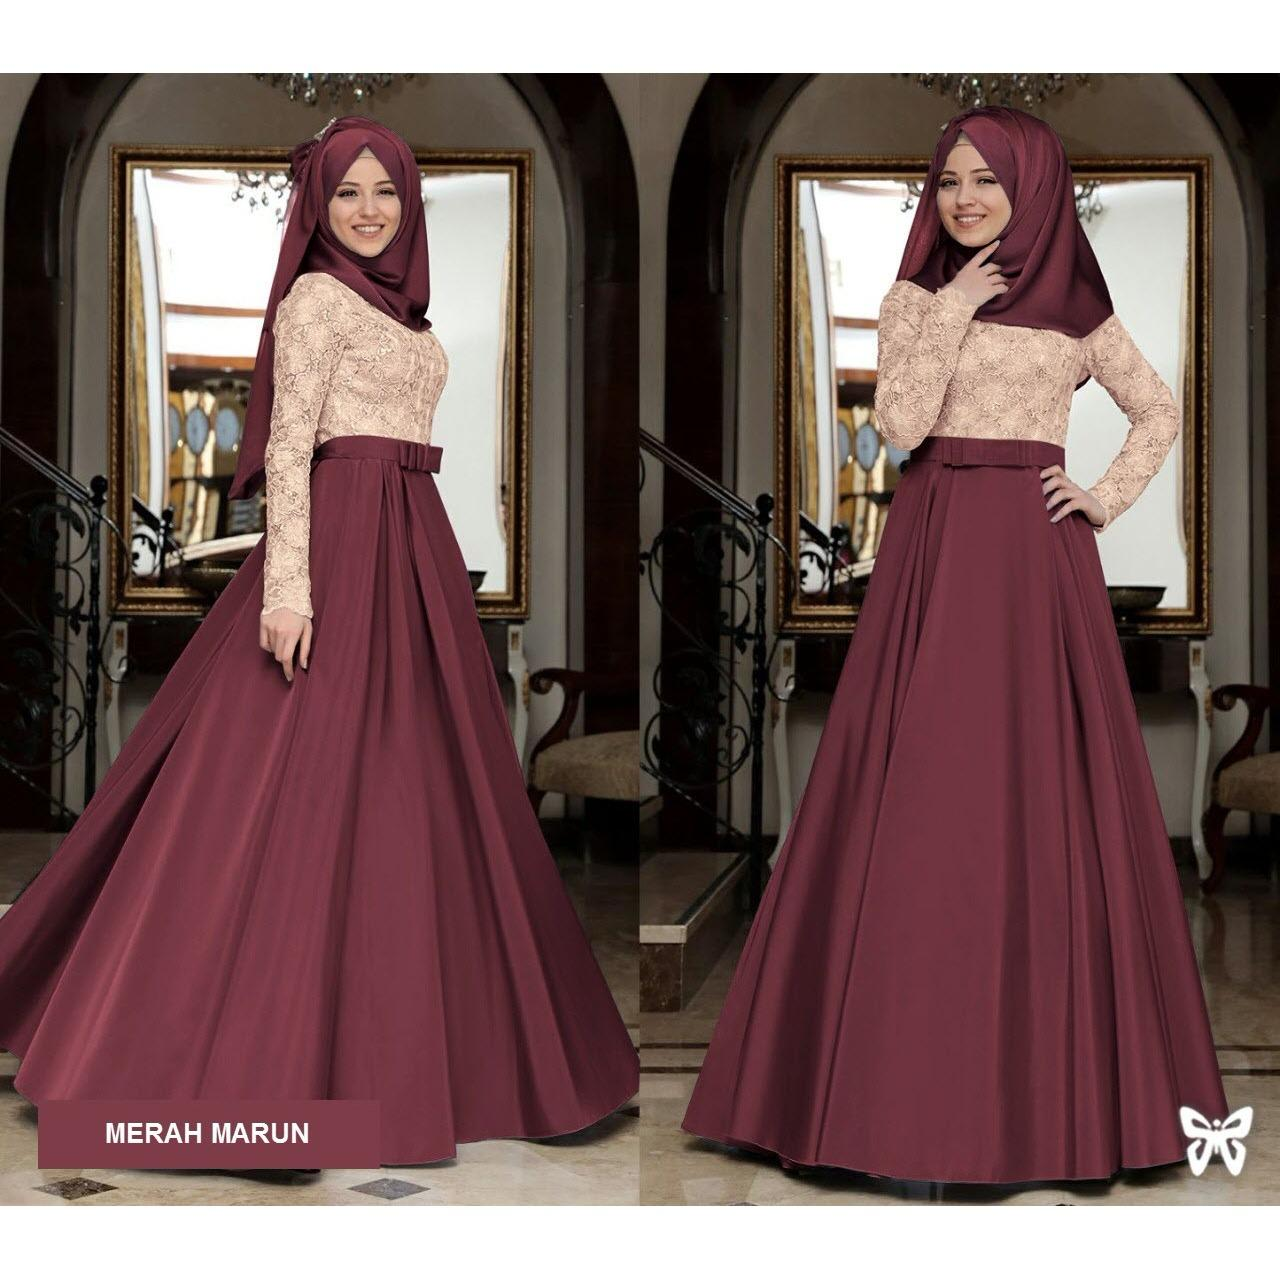 Flavia Store Maxi Dress Lengan Panjang Set 2 in 1 FS0767 - MERAH MARUN / Gamis / Gaun Pesta Muslimah / Baju Muslim Wanita / Hijab / Srmahira